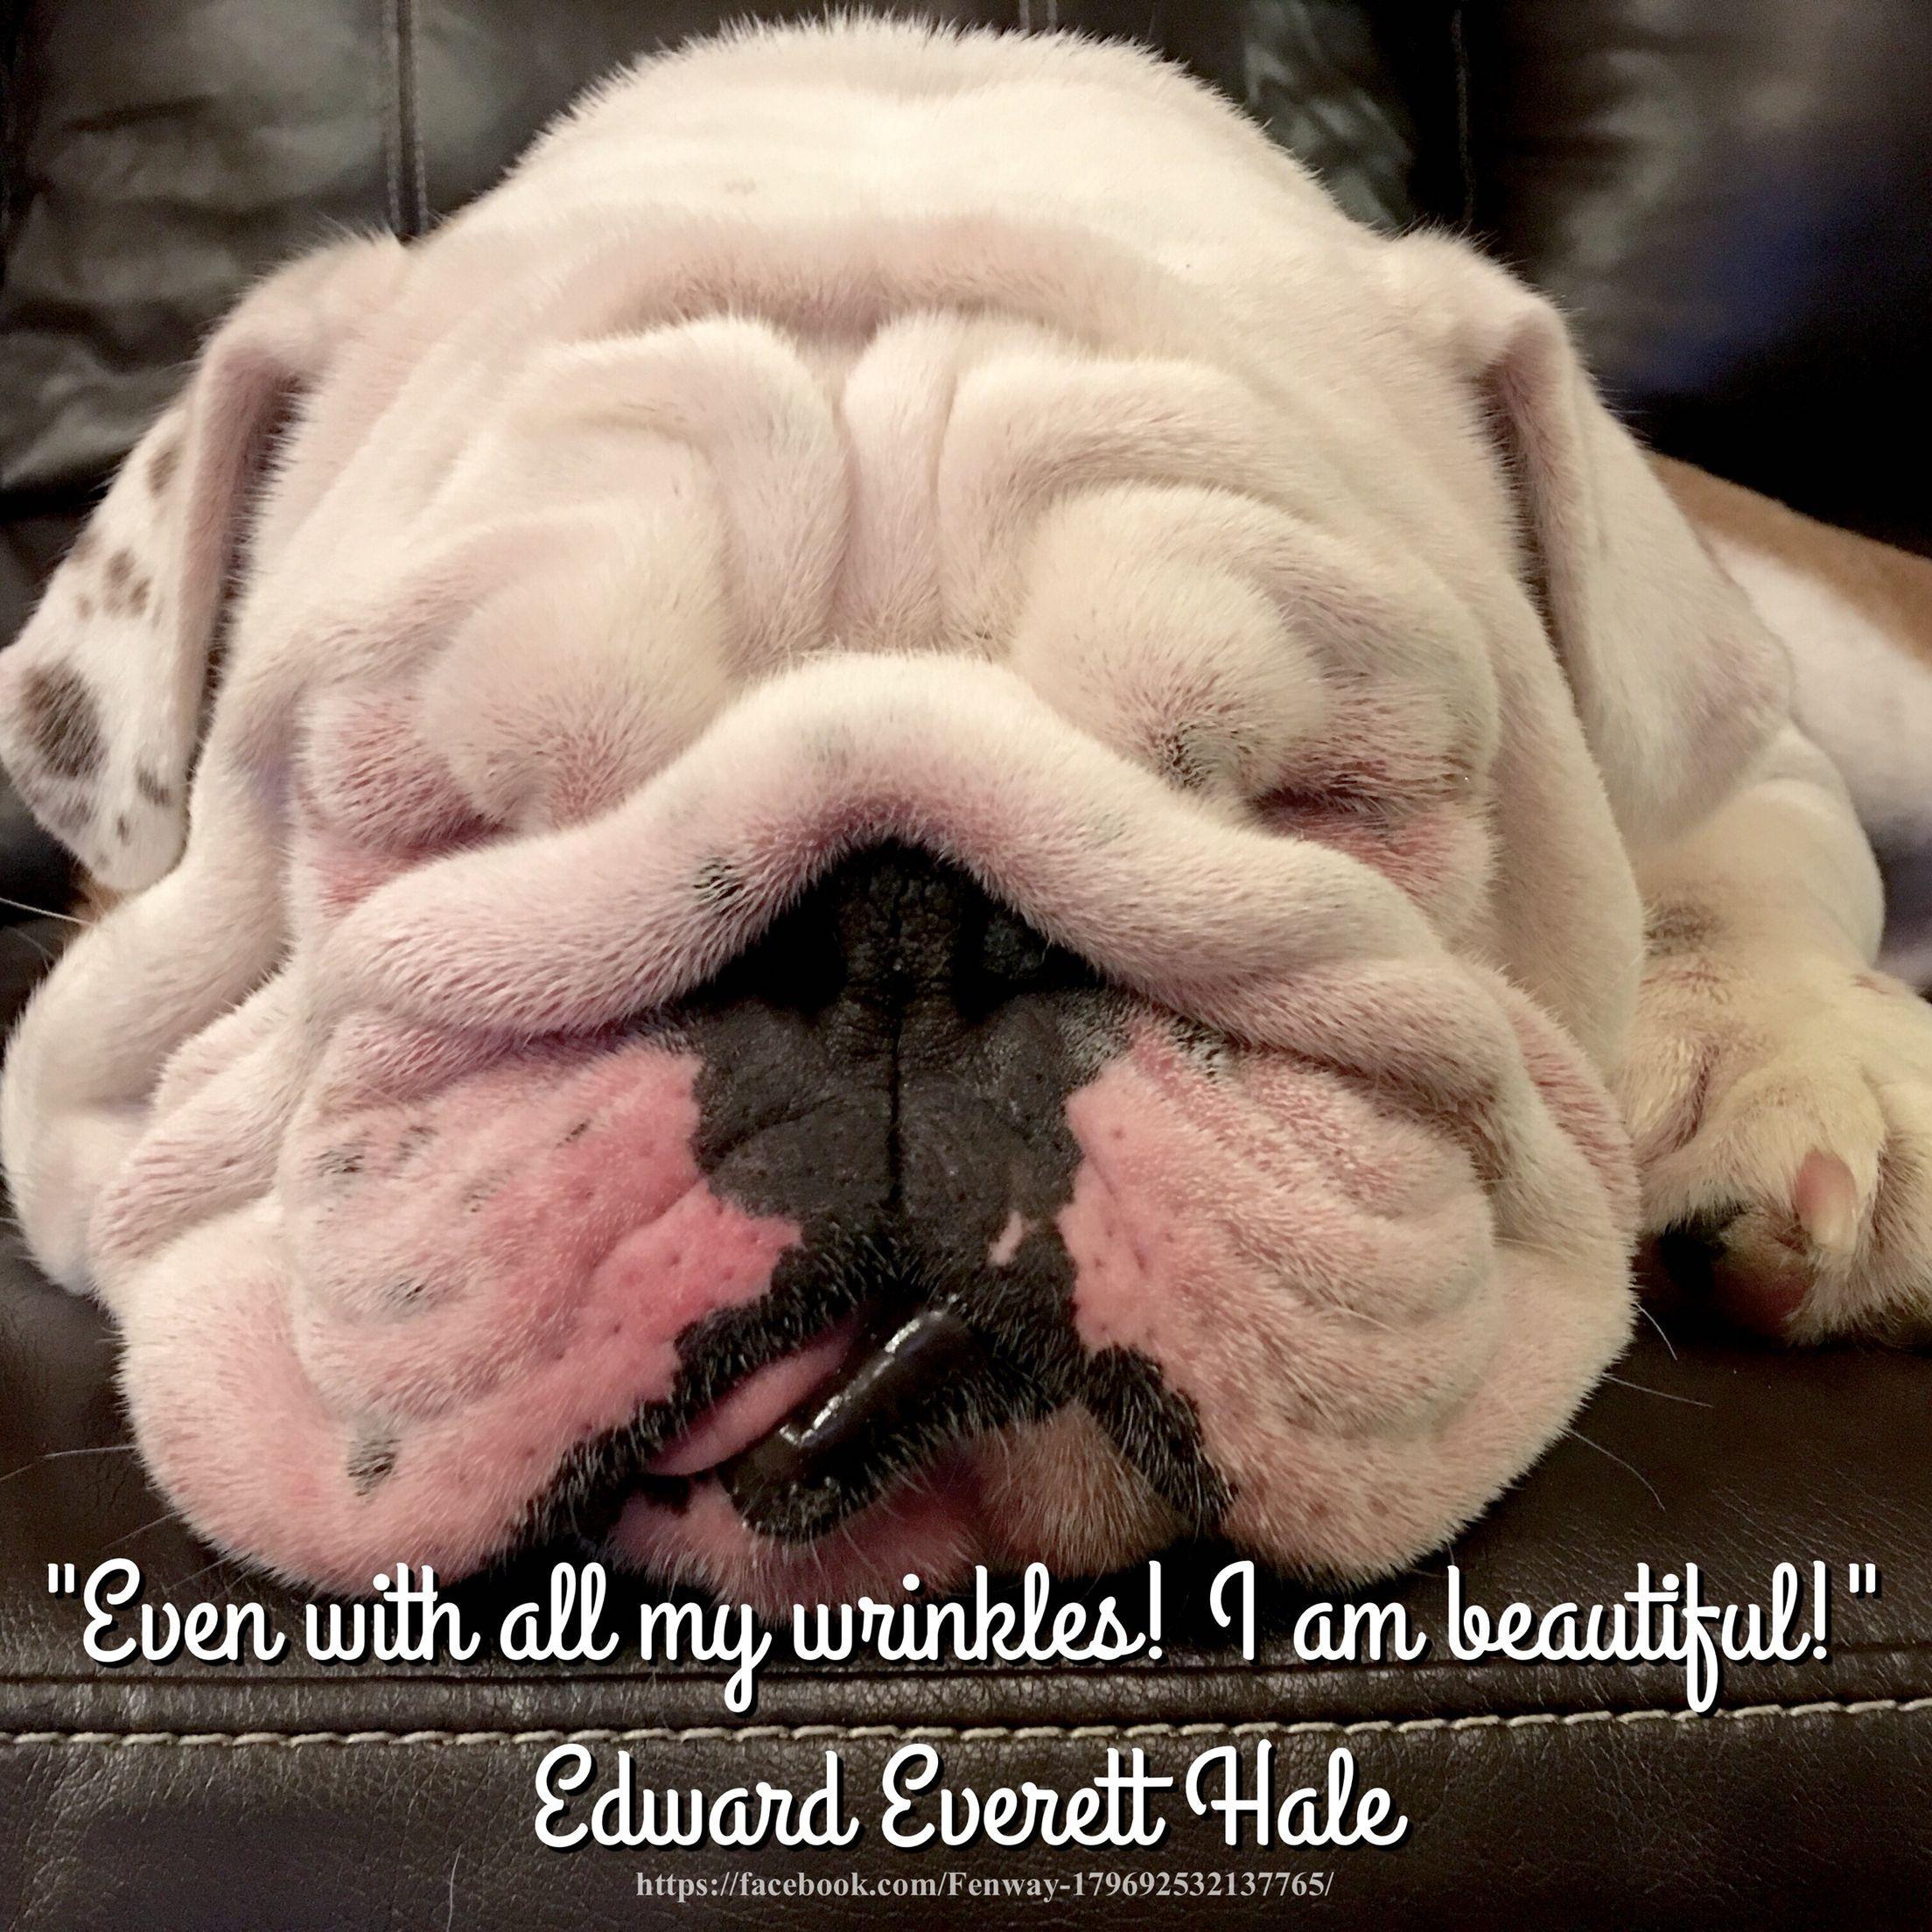 24mar16 Lola Bulldogs Wrinkles Quotes English Bulldog Funny Bulldog Funny Bulldog